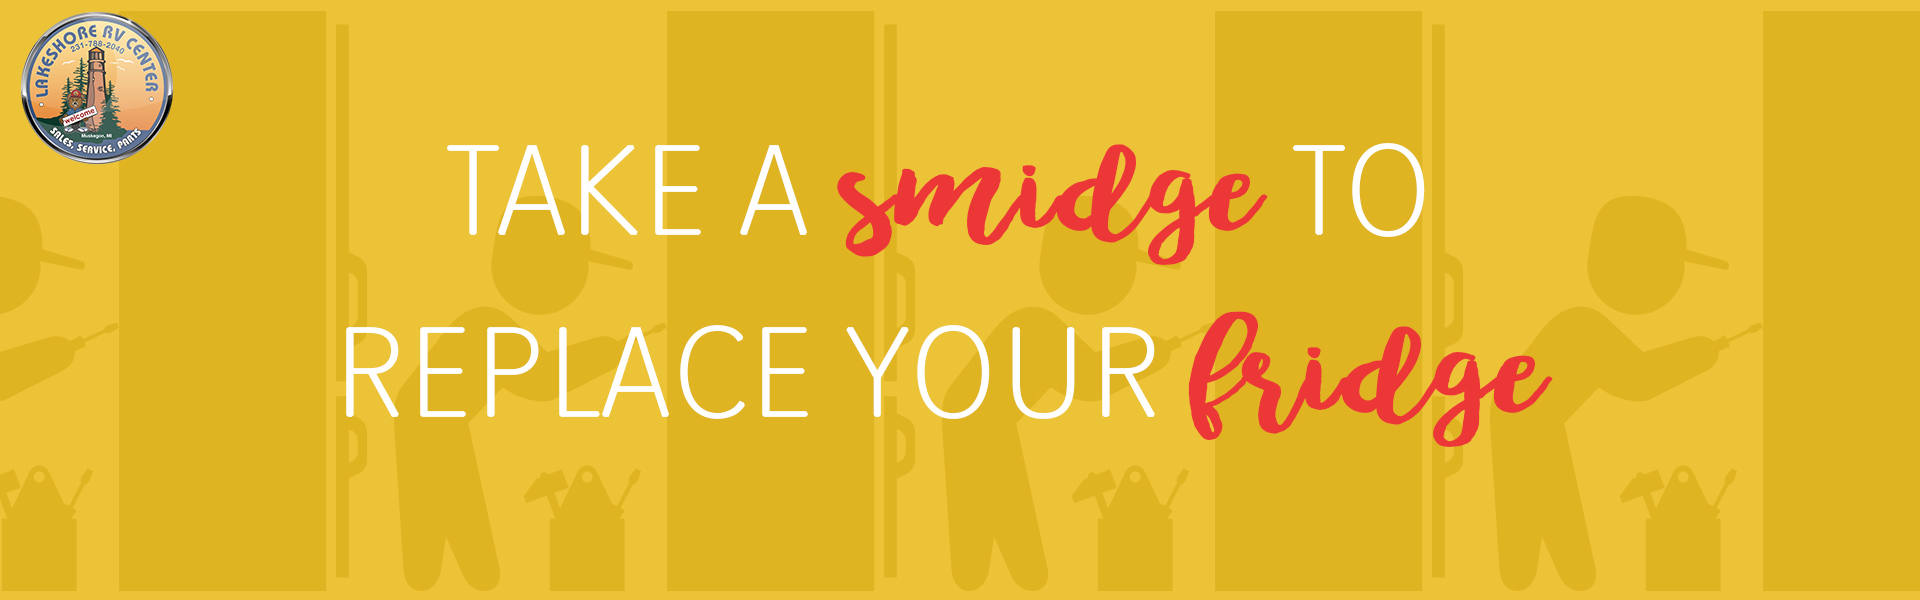 take a smidge to replace your fridge